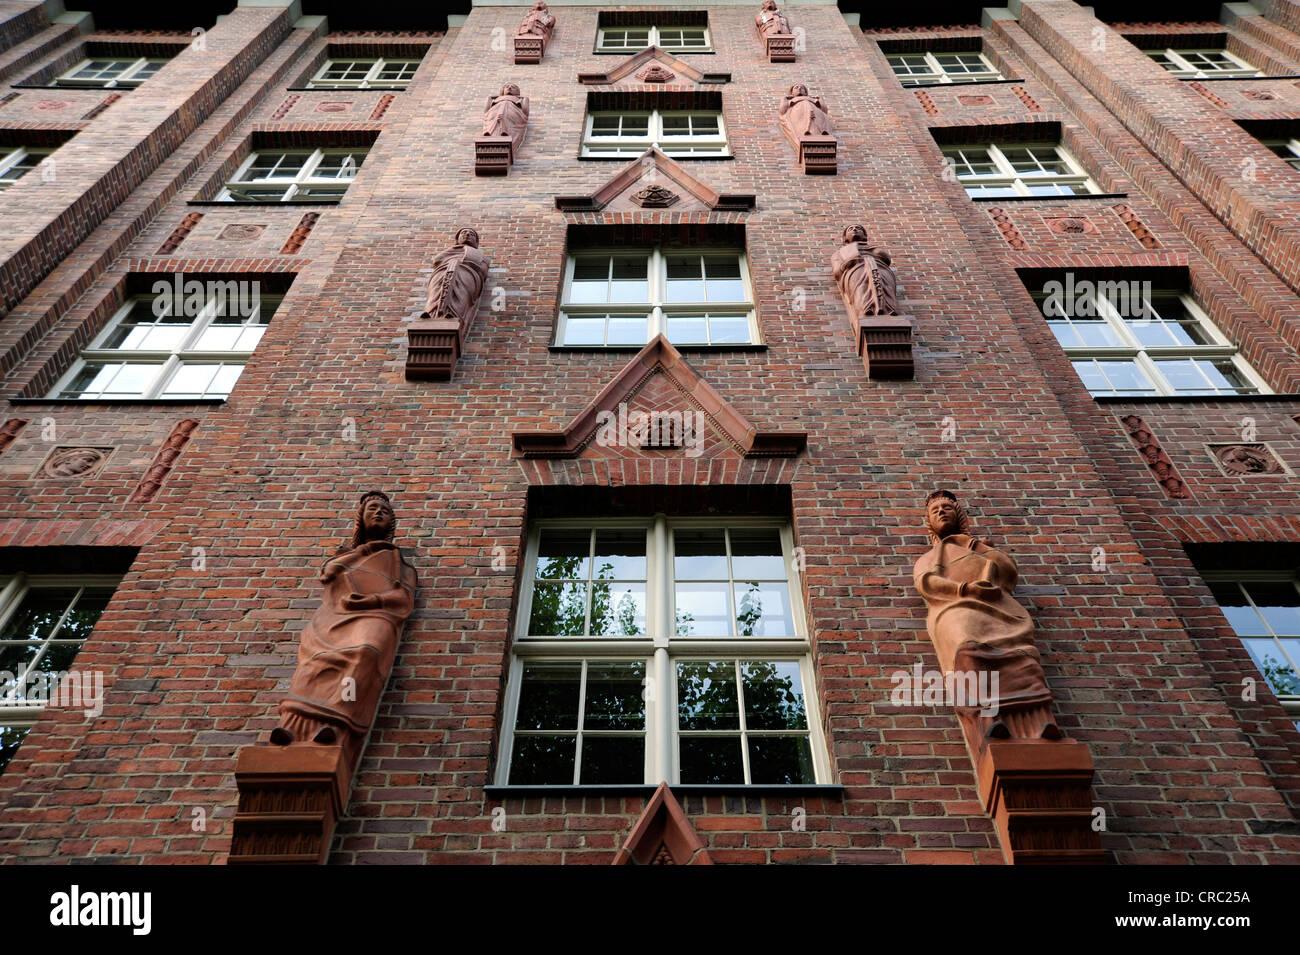 Senate Department for Integration, brick building, Oranienstrasse, Berlin Kreuzberg, Germany, Europe - Stock Image